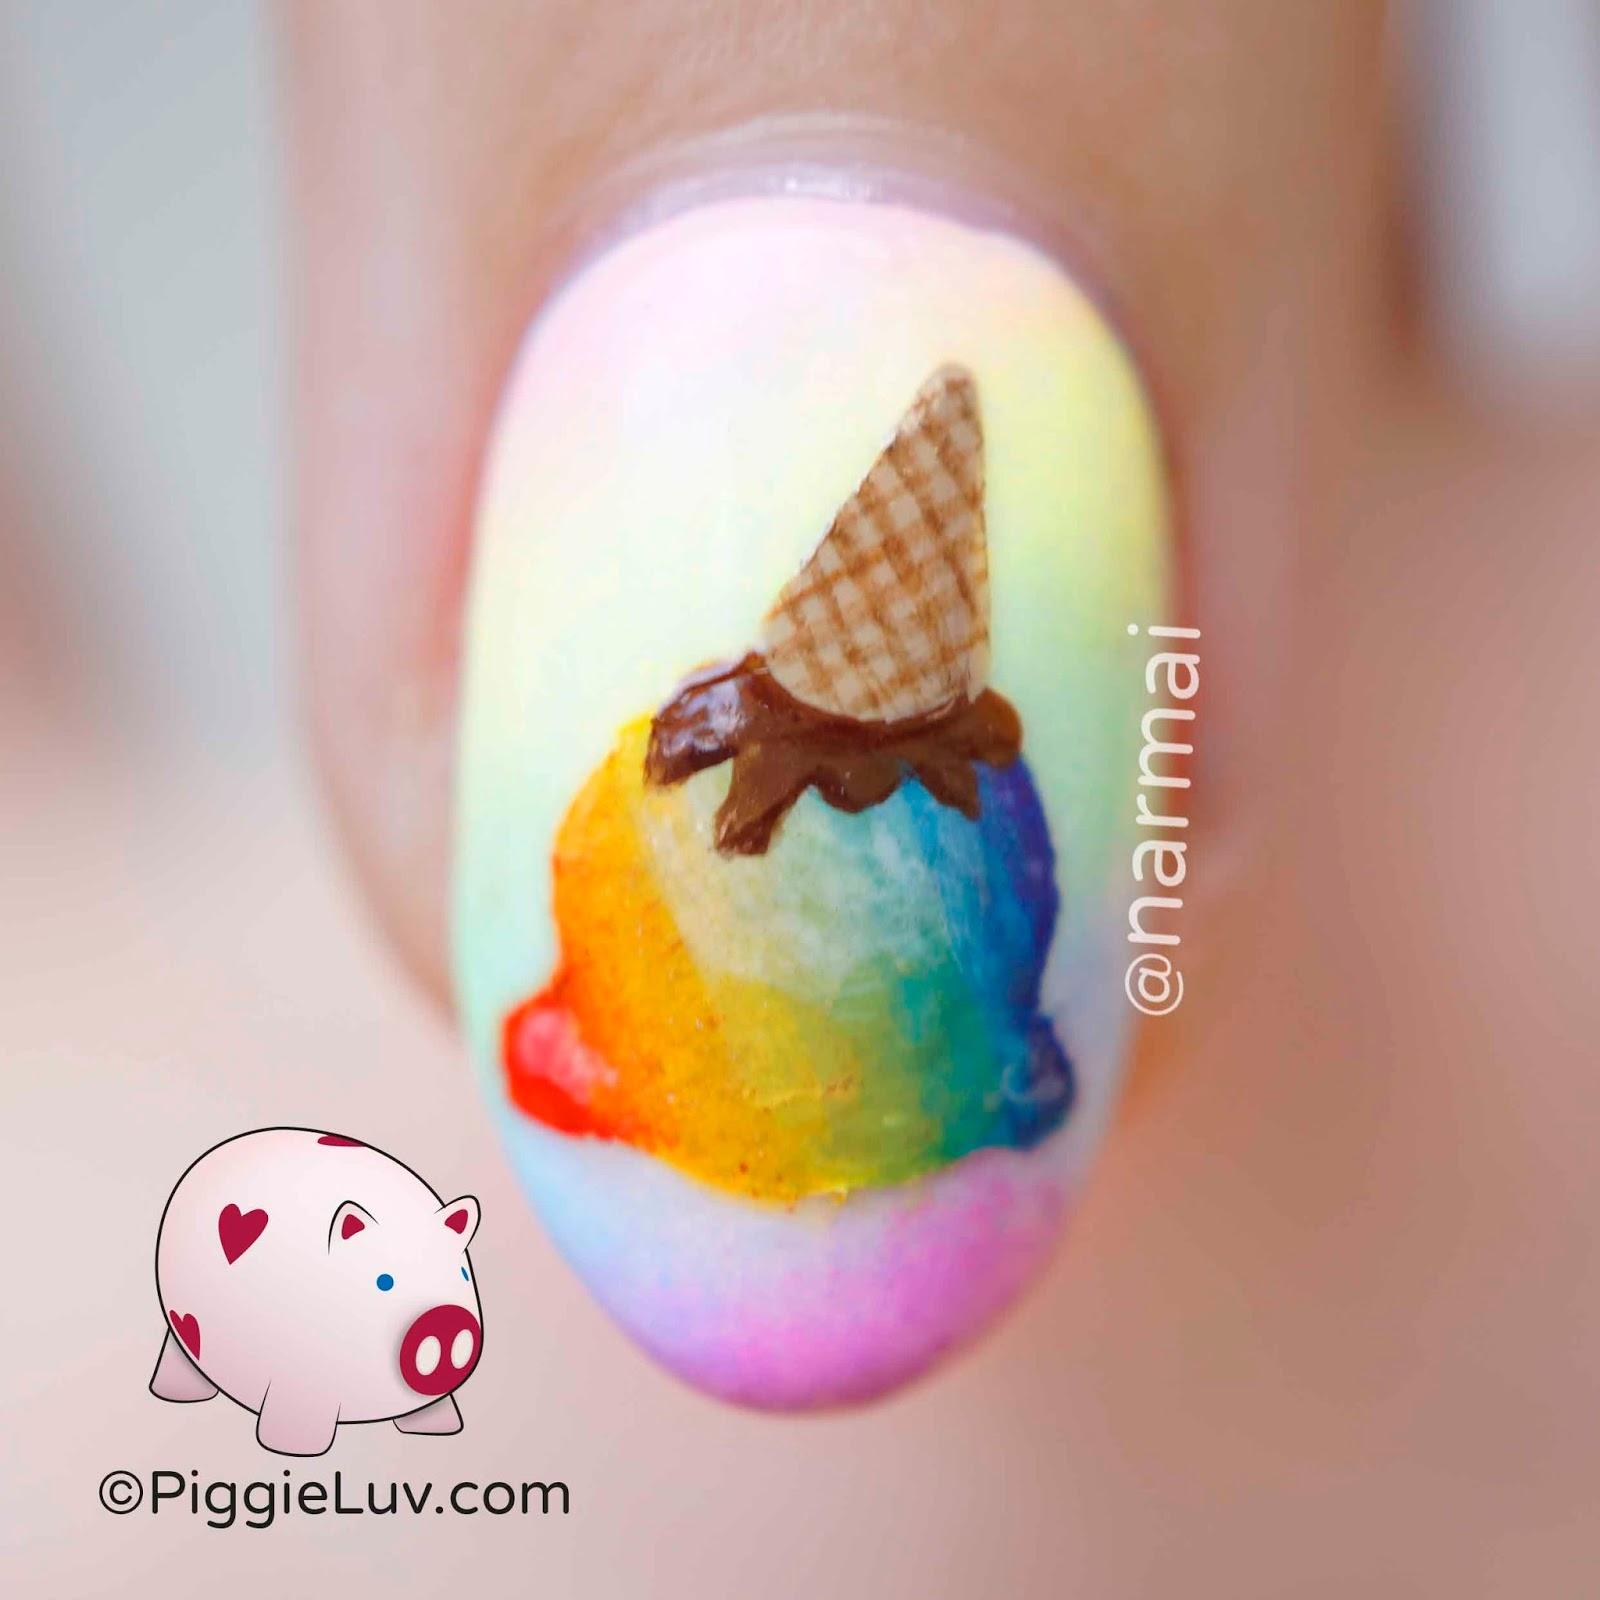 Piggieluv Rainbow Bubbles Nail Art: PiggieLuv: Rainbow Uni-cone Nail Art